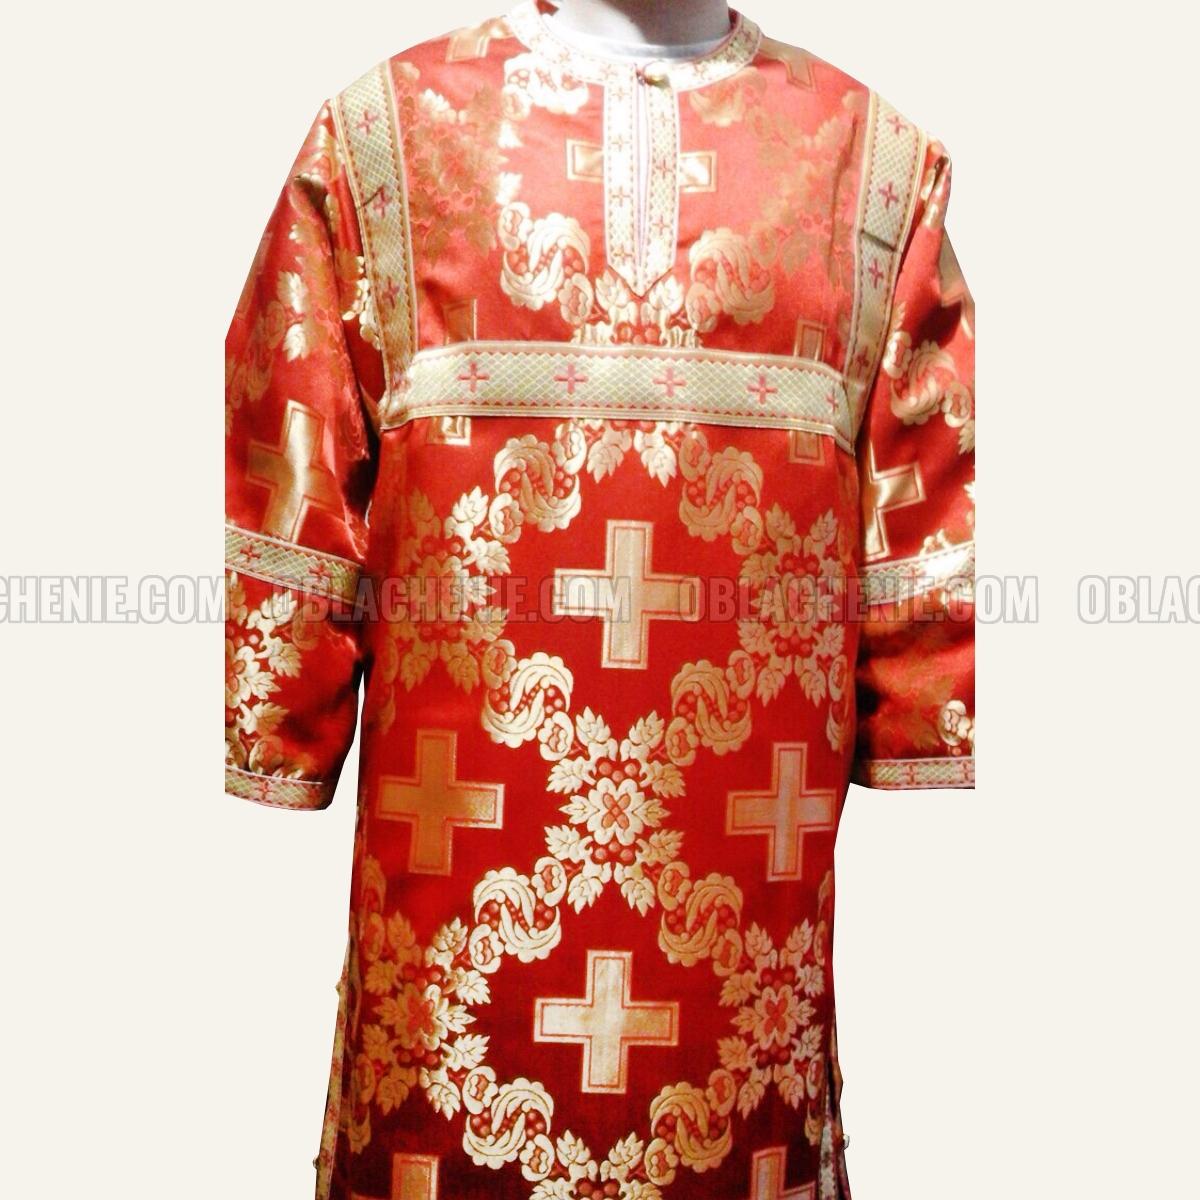 Altar server robes 10328